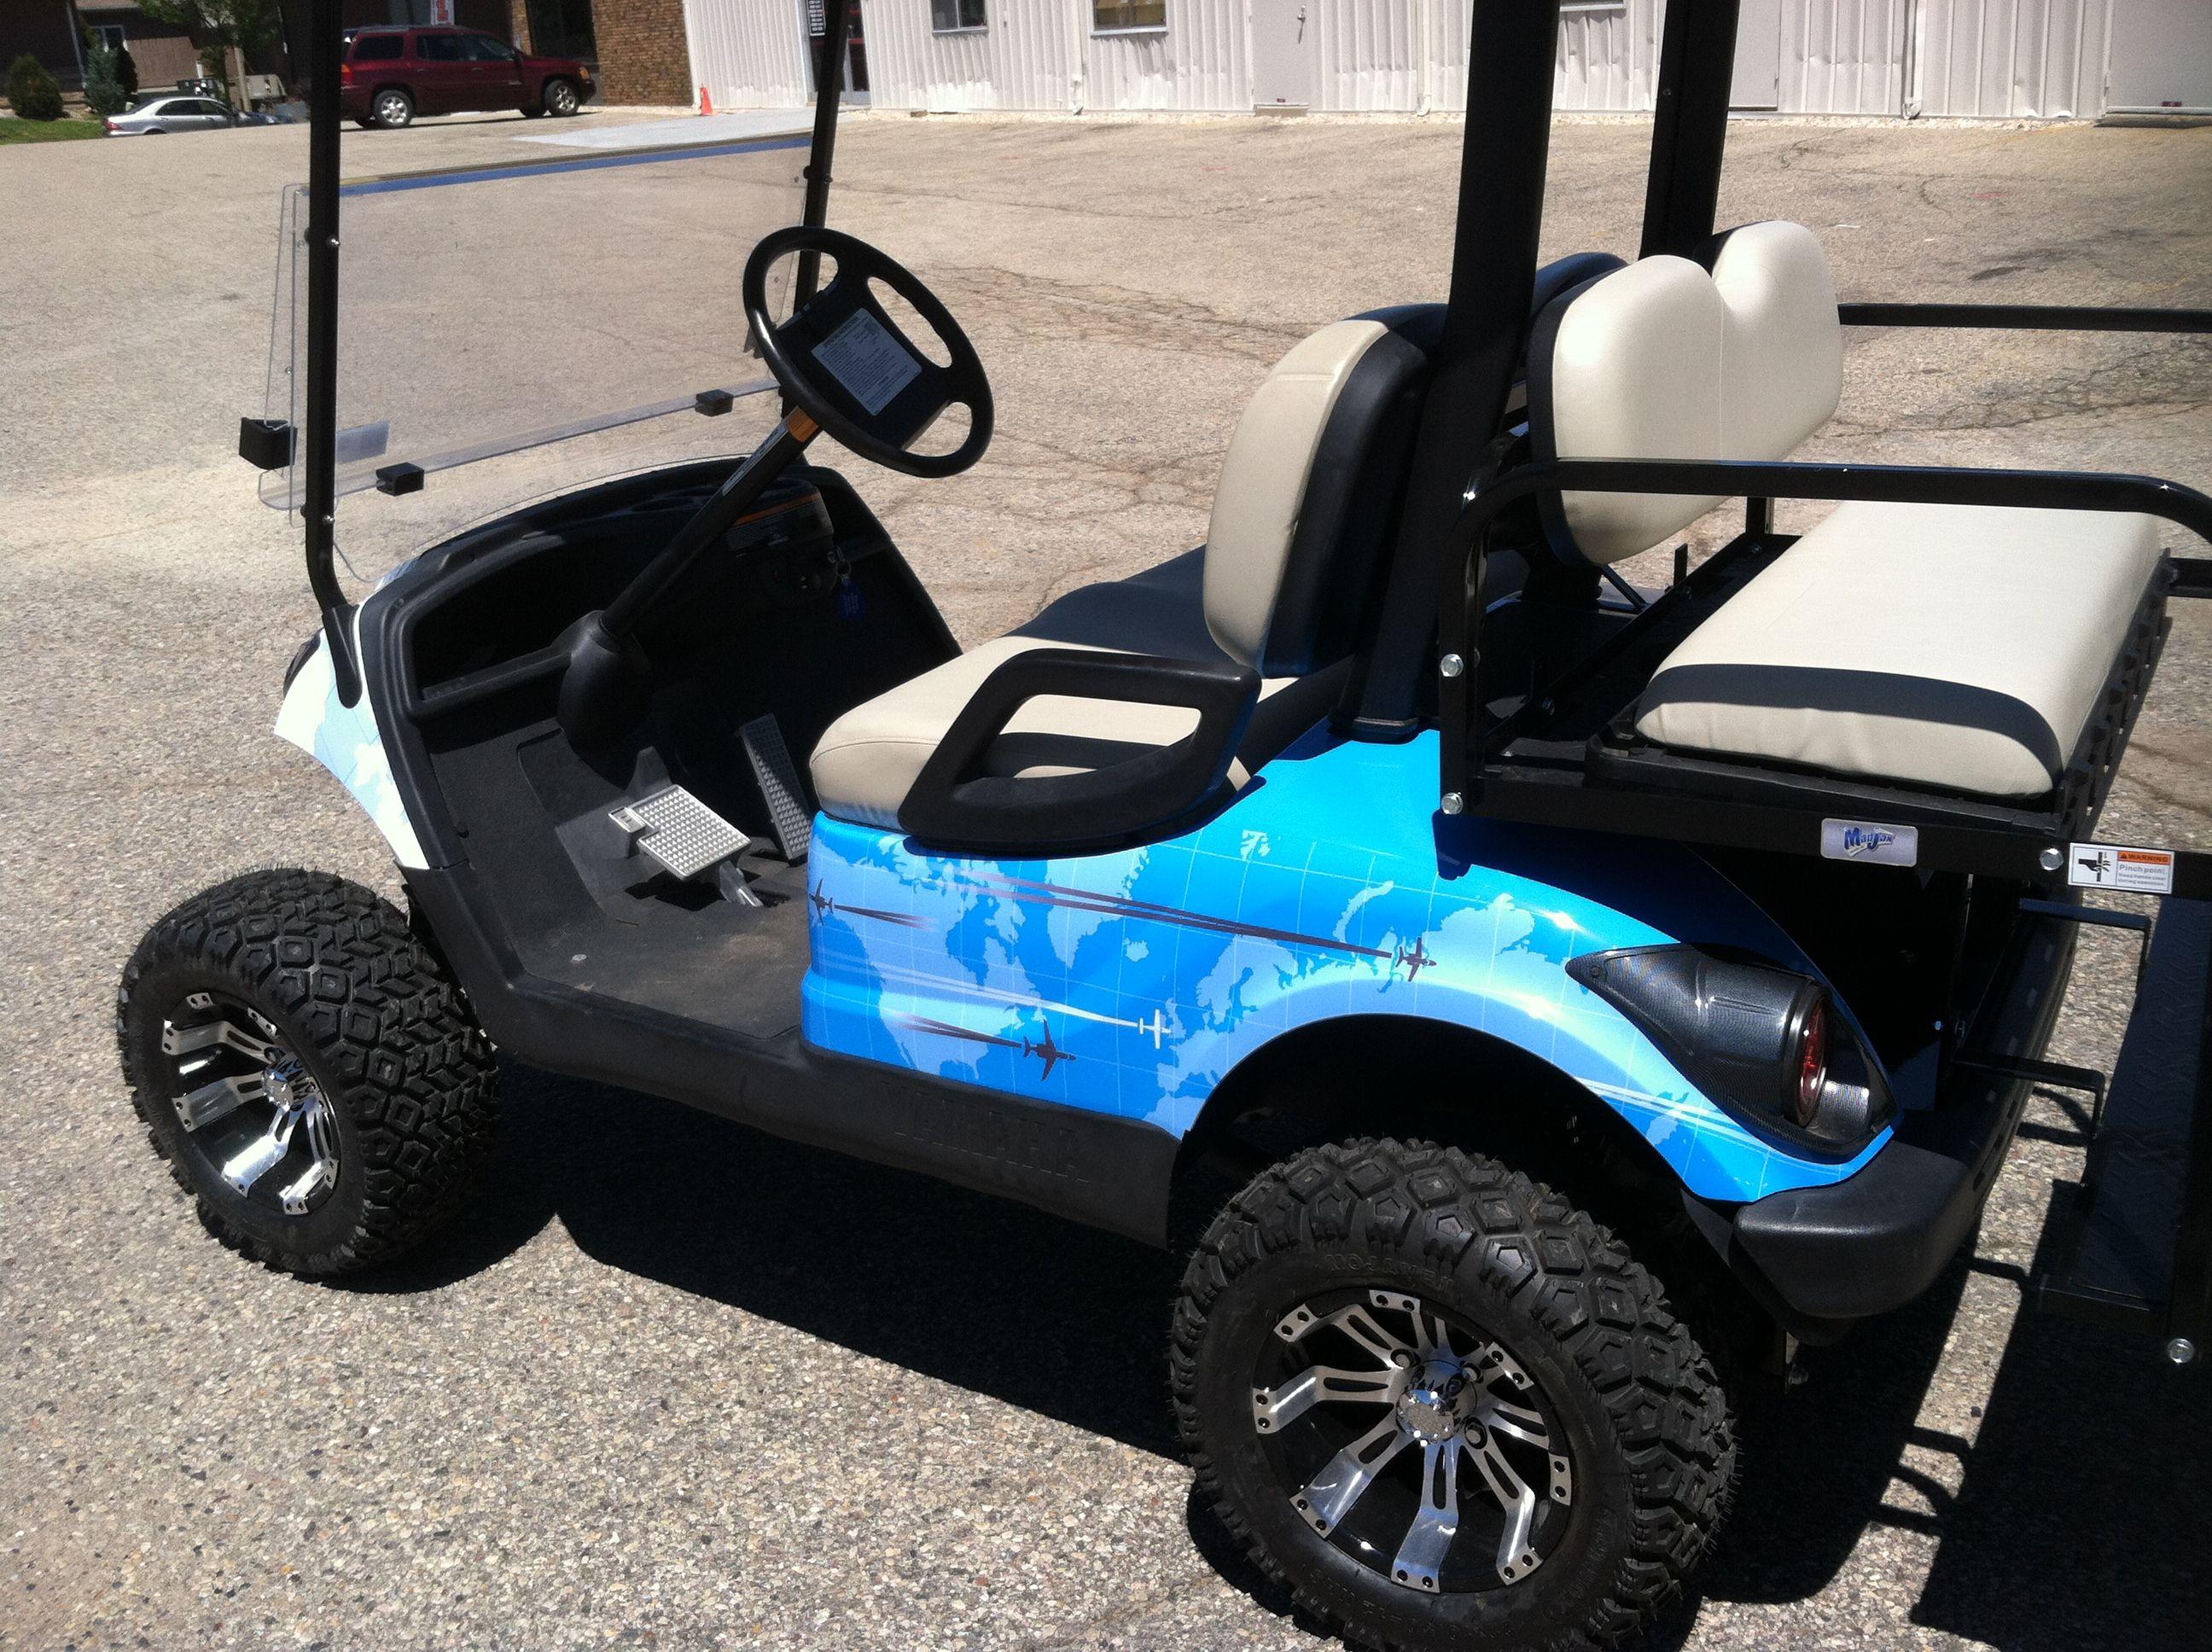 Jet Aviva Golf Cart Wrap Done By Monarch Media Designs In Madison Wi Monarchworld Com Golf Carts Car Wrap Vehicles